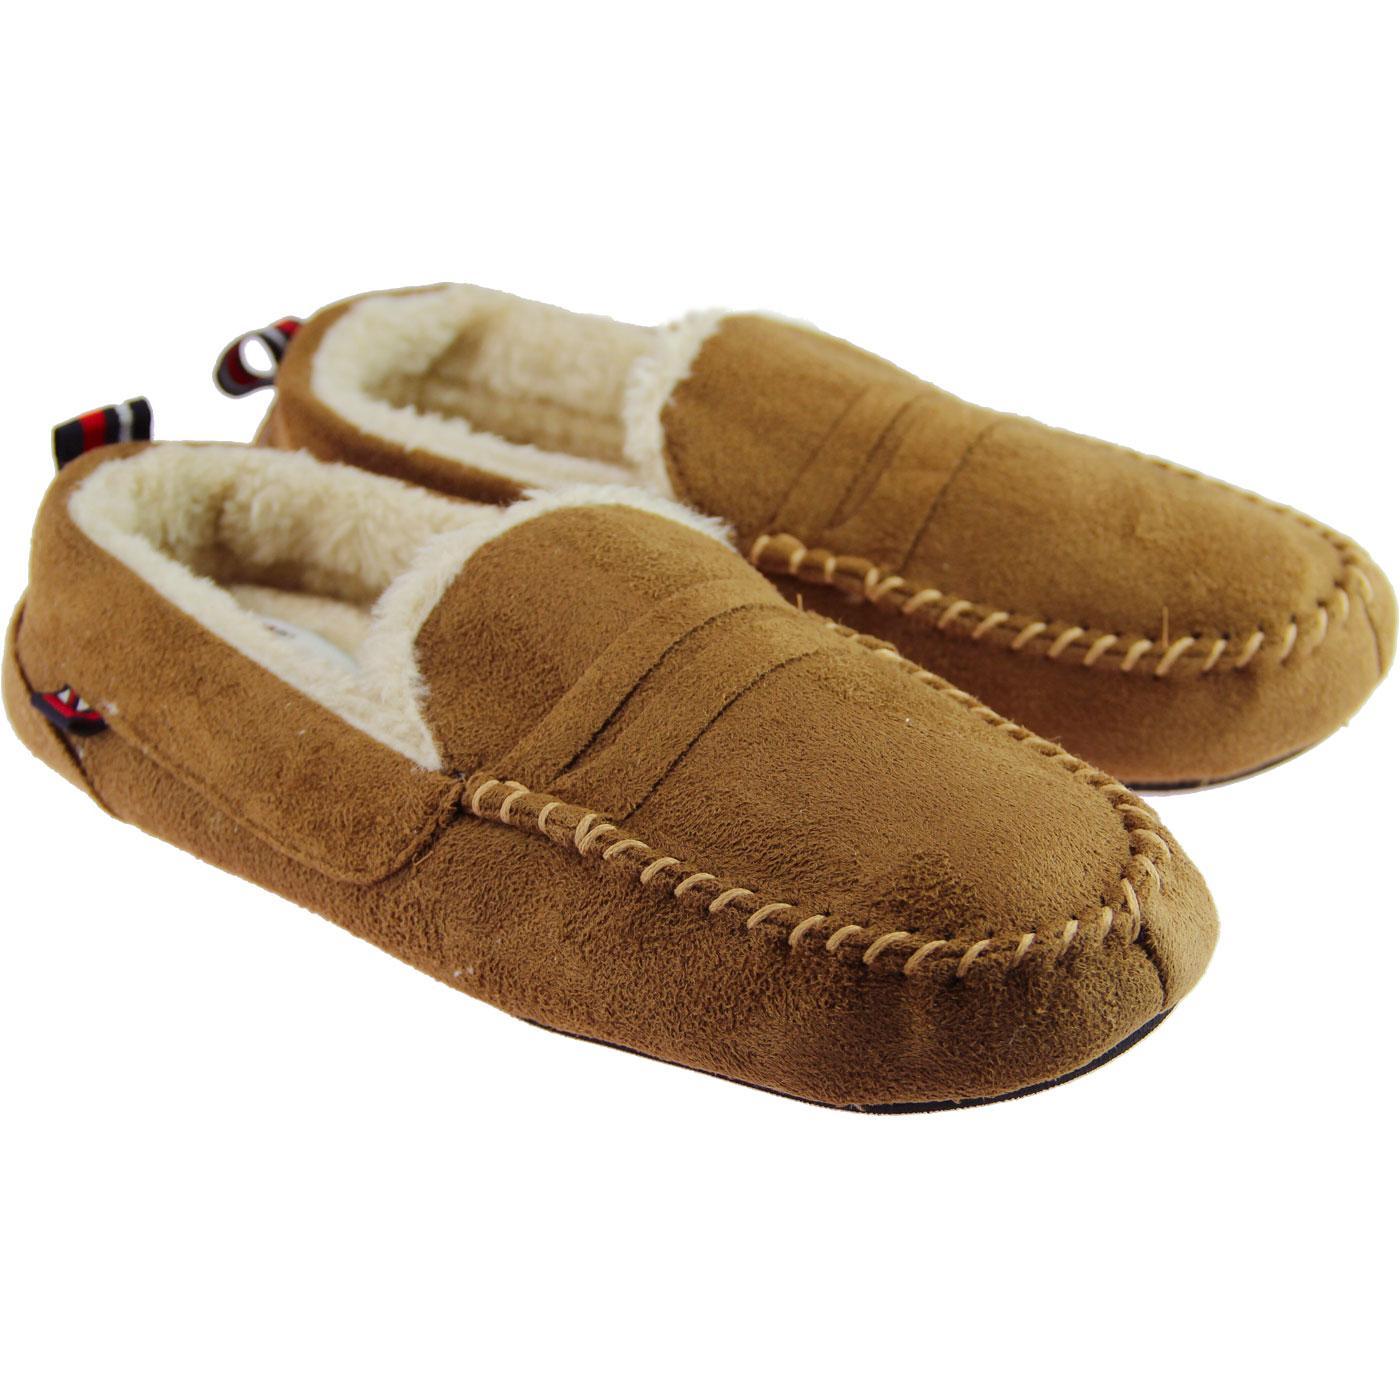 1607fecc06ff BEN SHERMAN Four Seasons Mod Moccasin Slippers is Tan